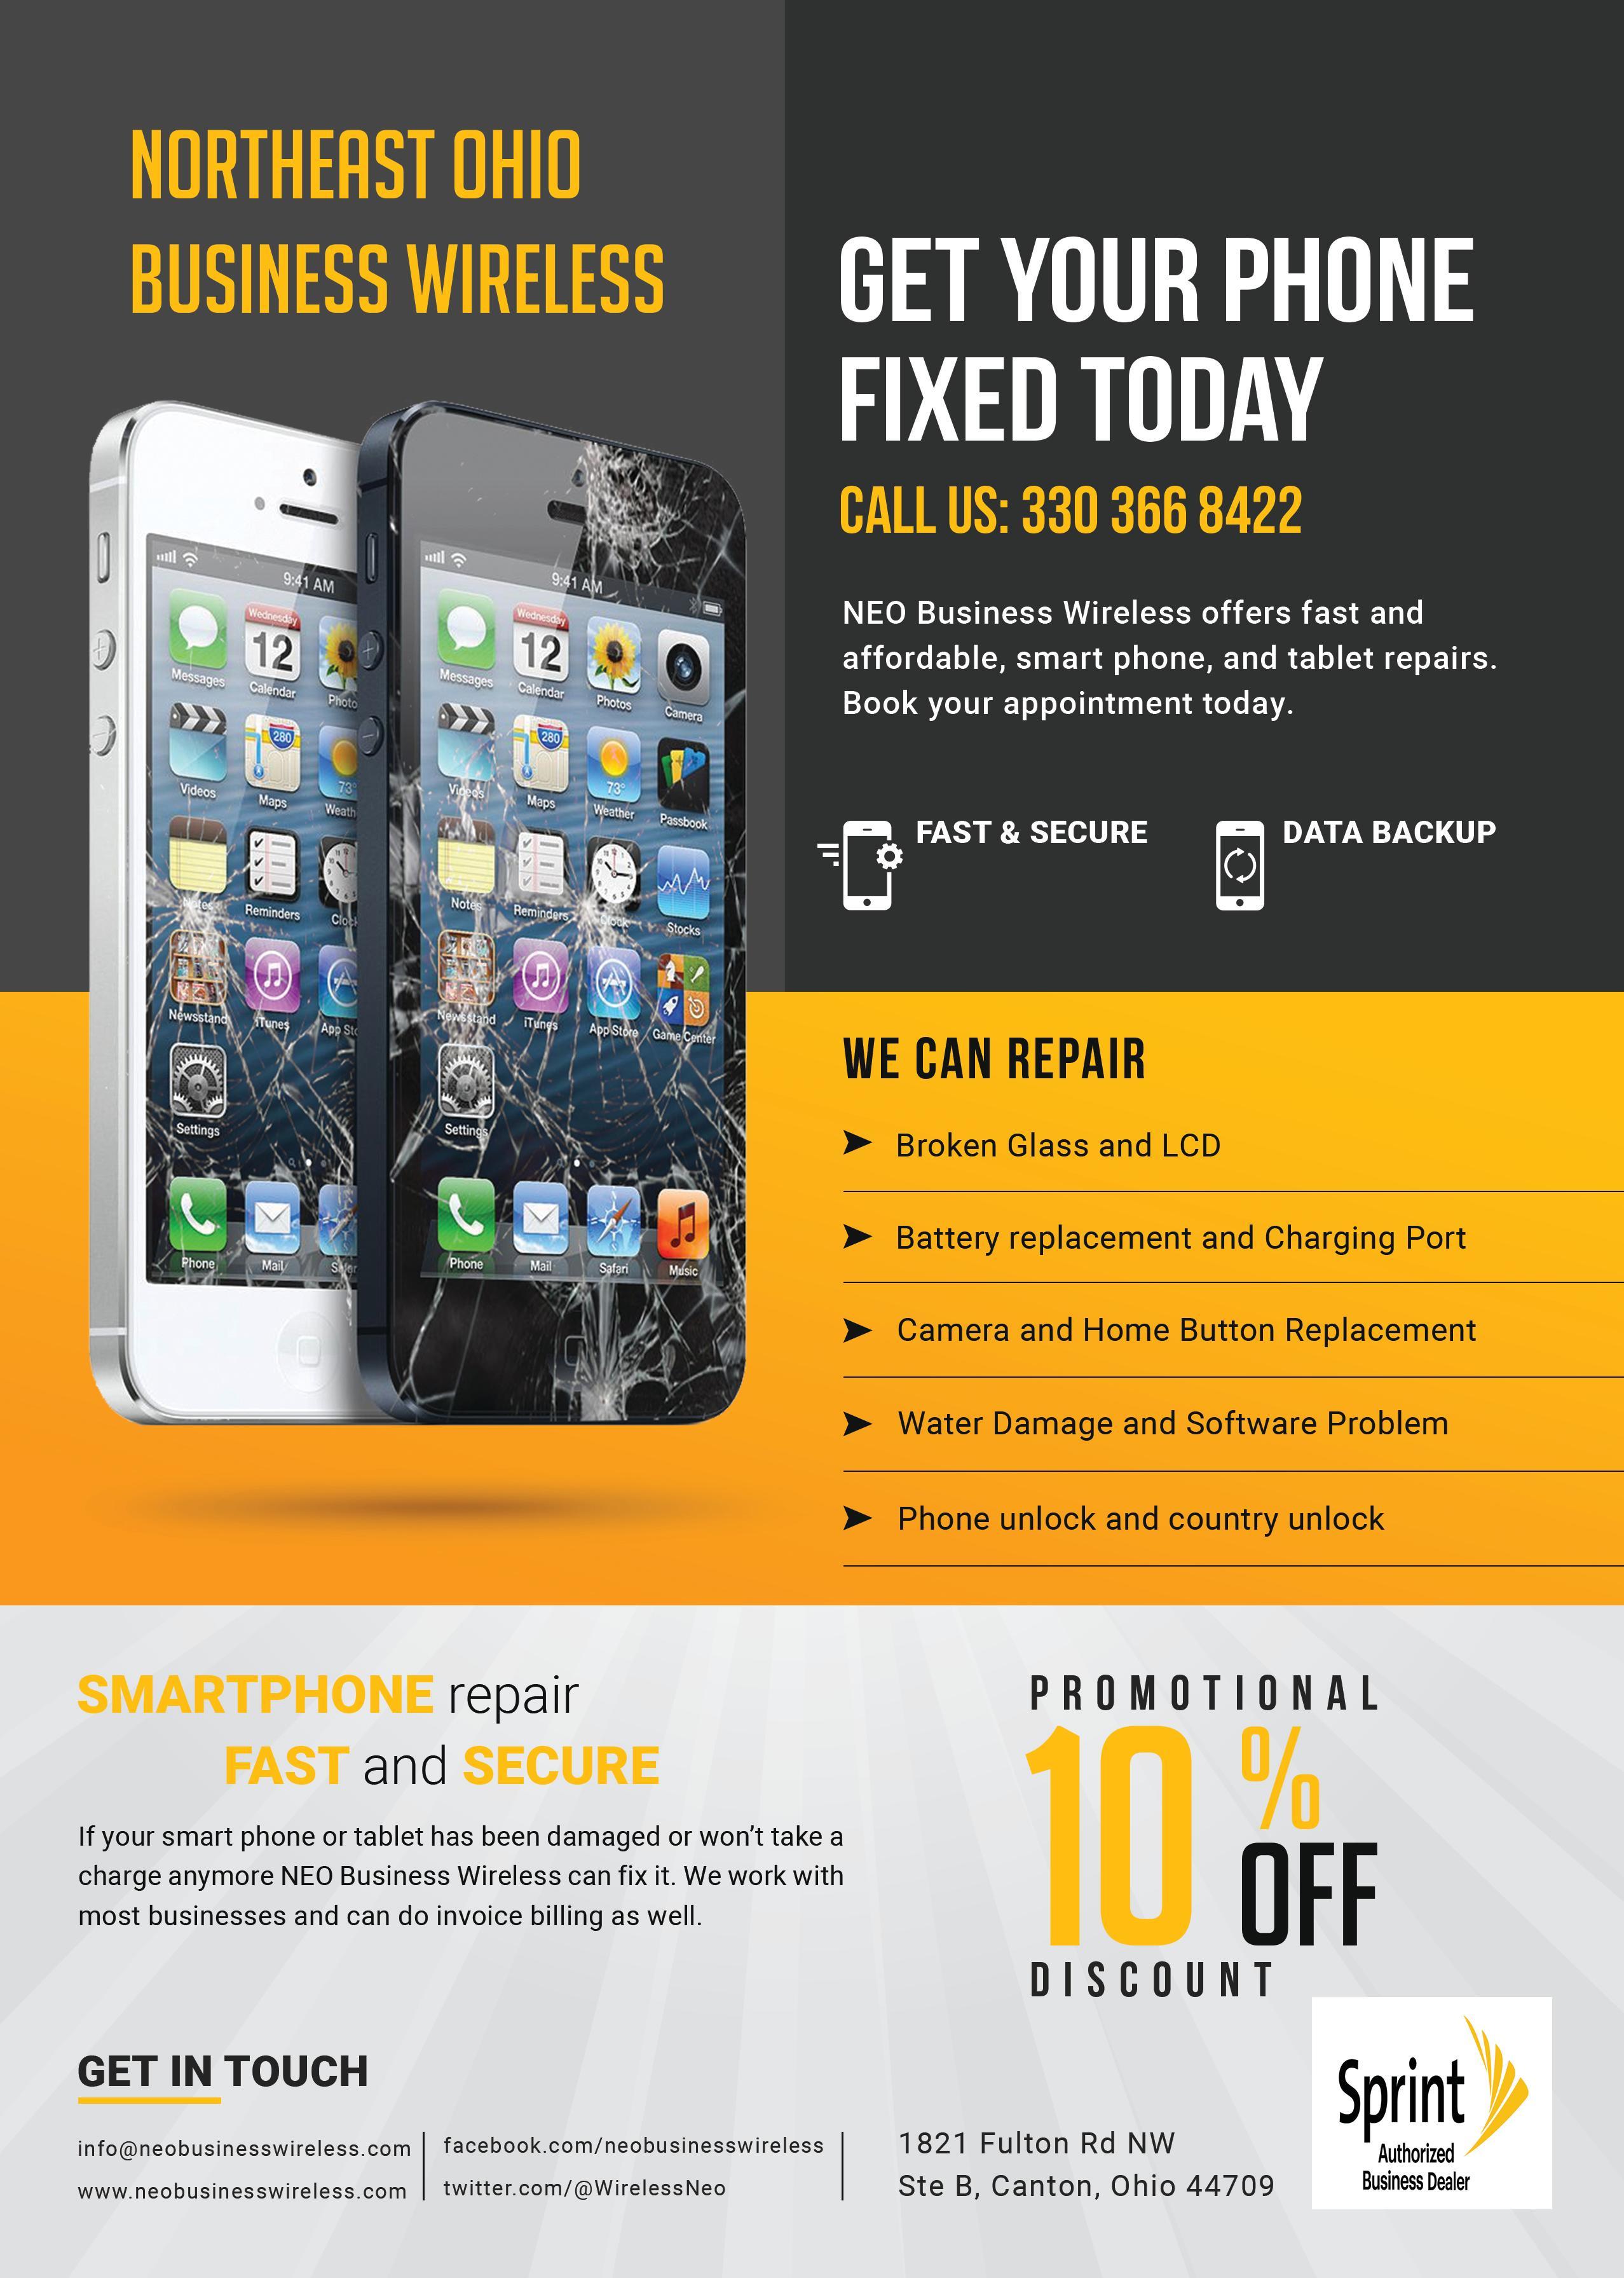 NEO Business Wireless image 1